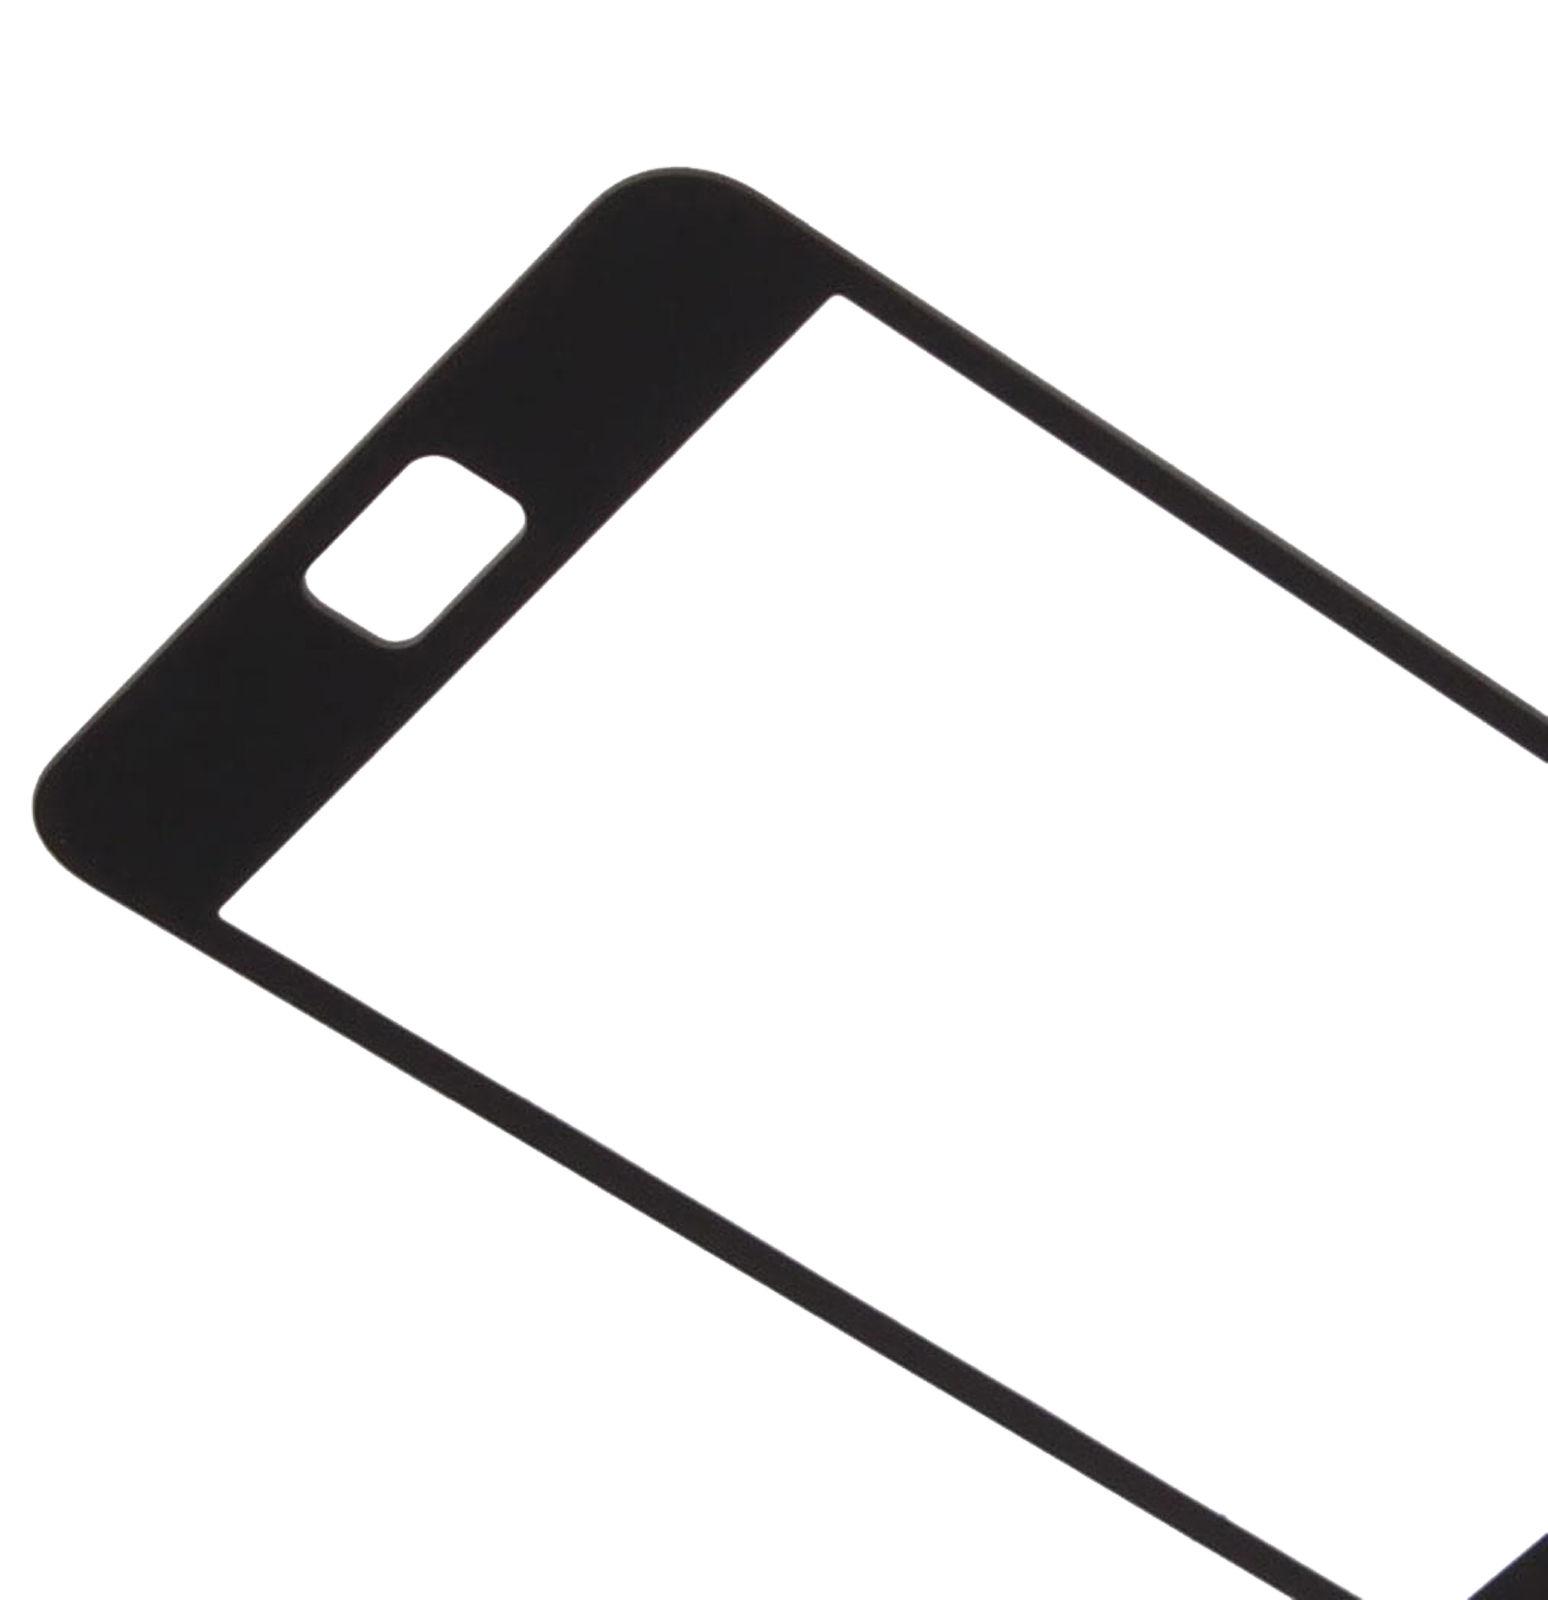 Samsung--Galaxy-II-S2-I9100-I9100G-I9105-I9105P-S2-Plus-Glass-Outer-Touch-گلس-شیشه-تاچ-لنز-گوشی-موبایل-سامسونگ-گلکسی-اس2.jpg